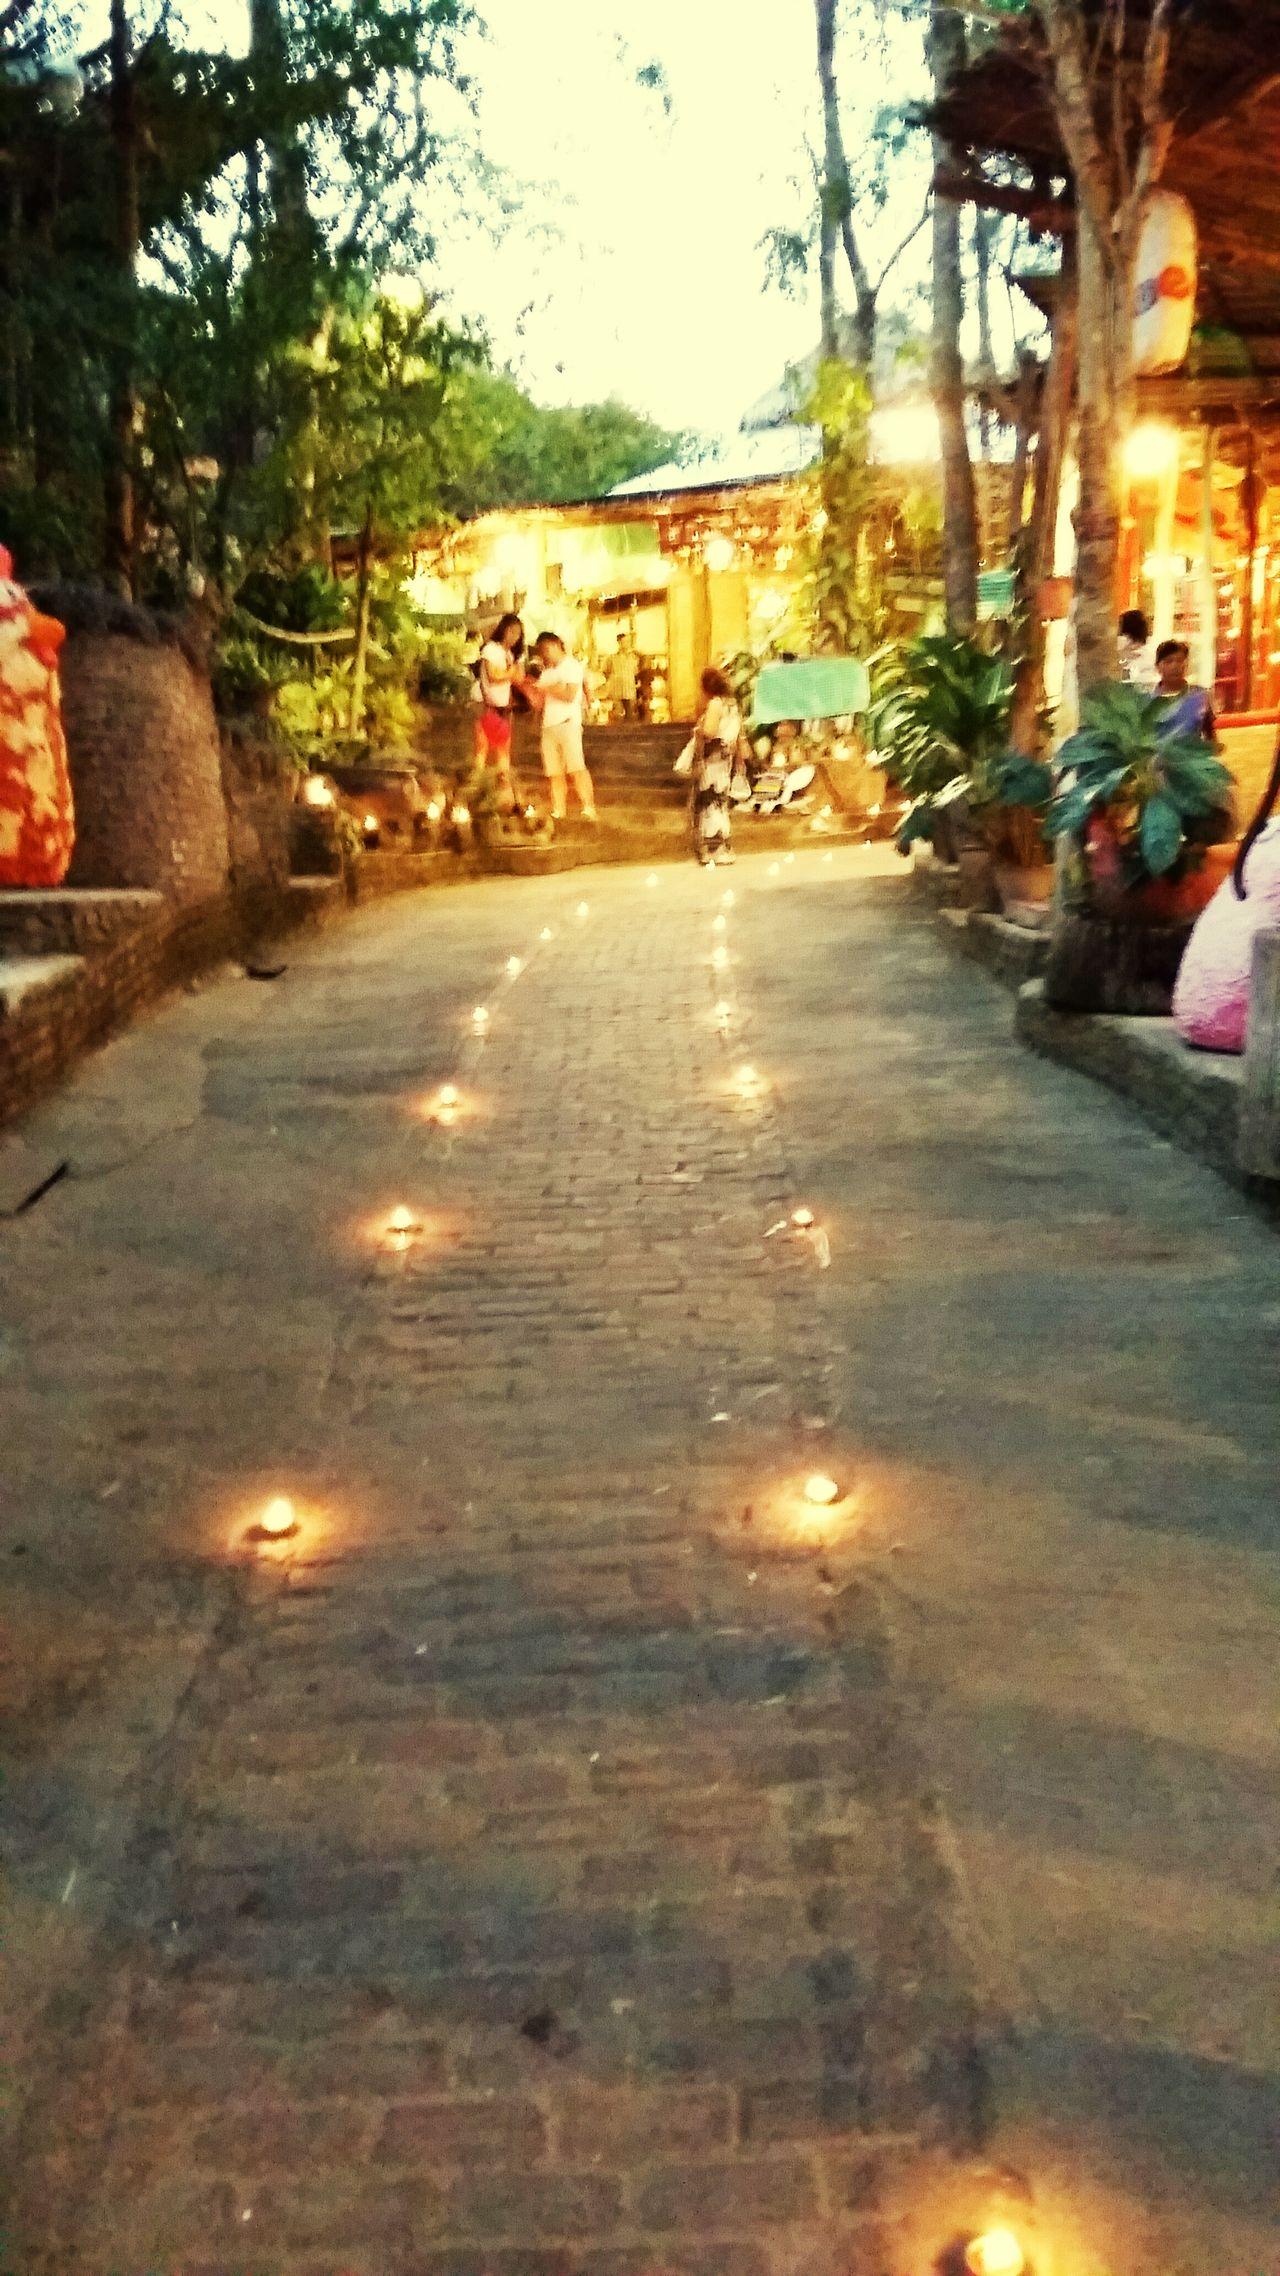 , Rajchaburi Province, Middle Earth Of Thailand Rajchaburi บ้านหอมเทียน ราชบุรี thailand